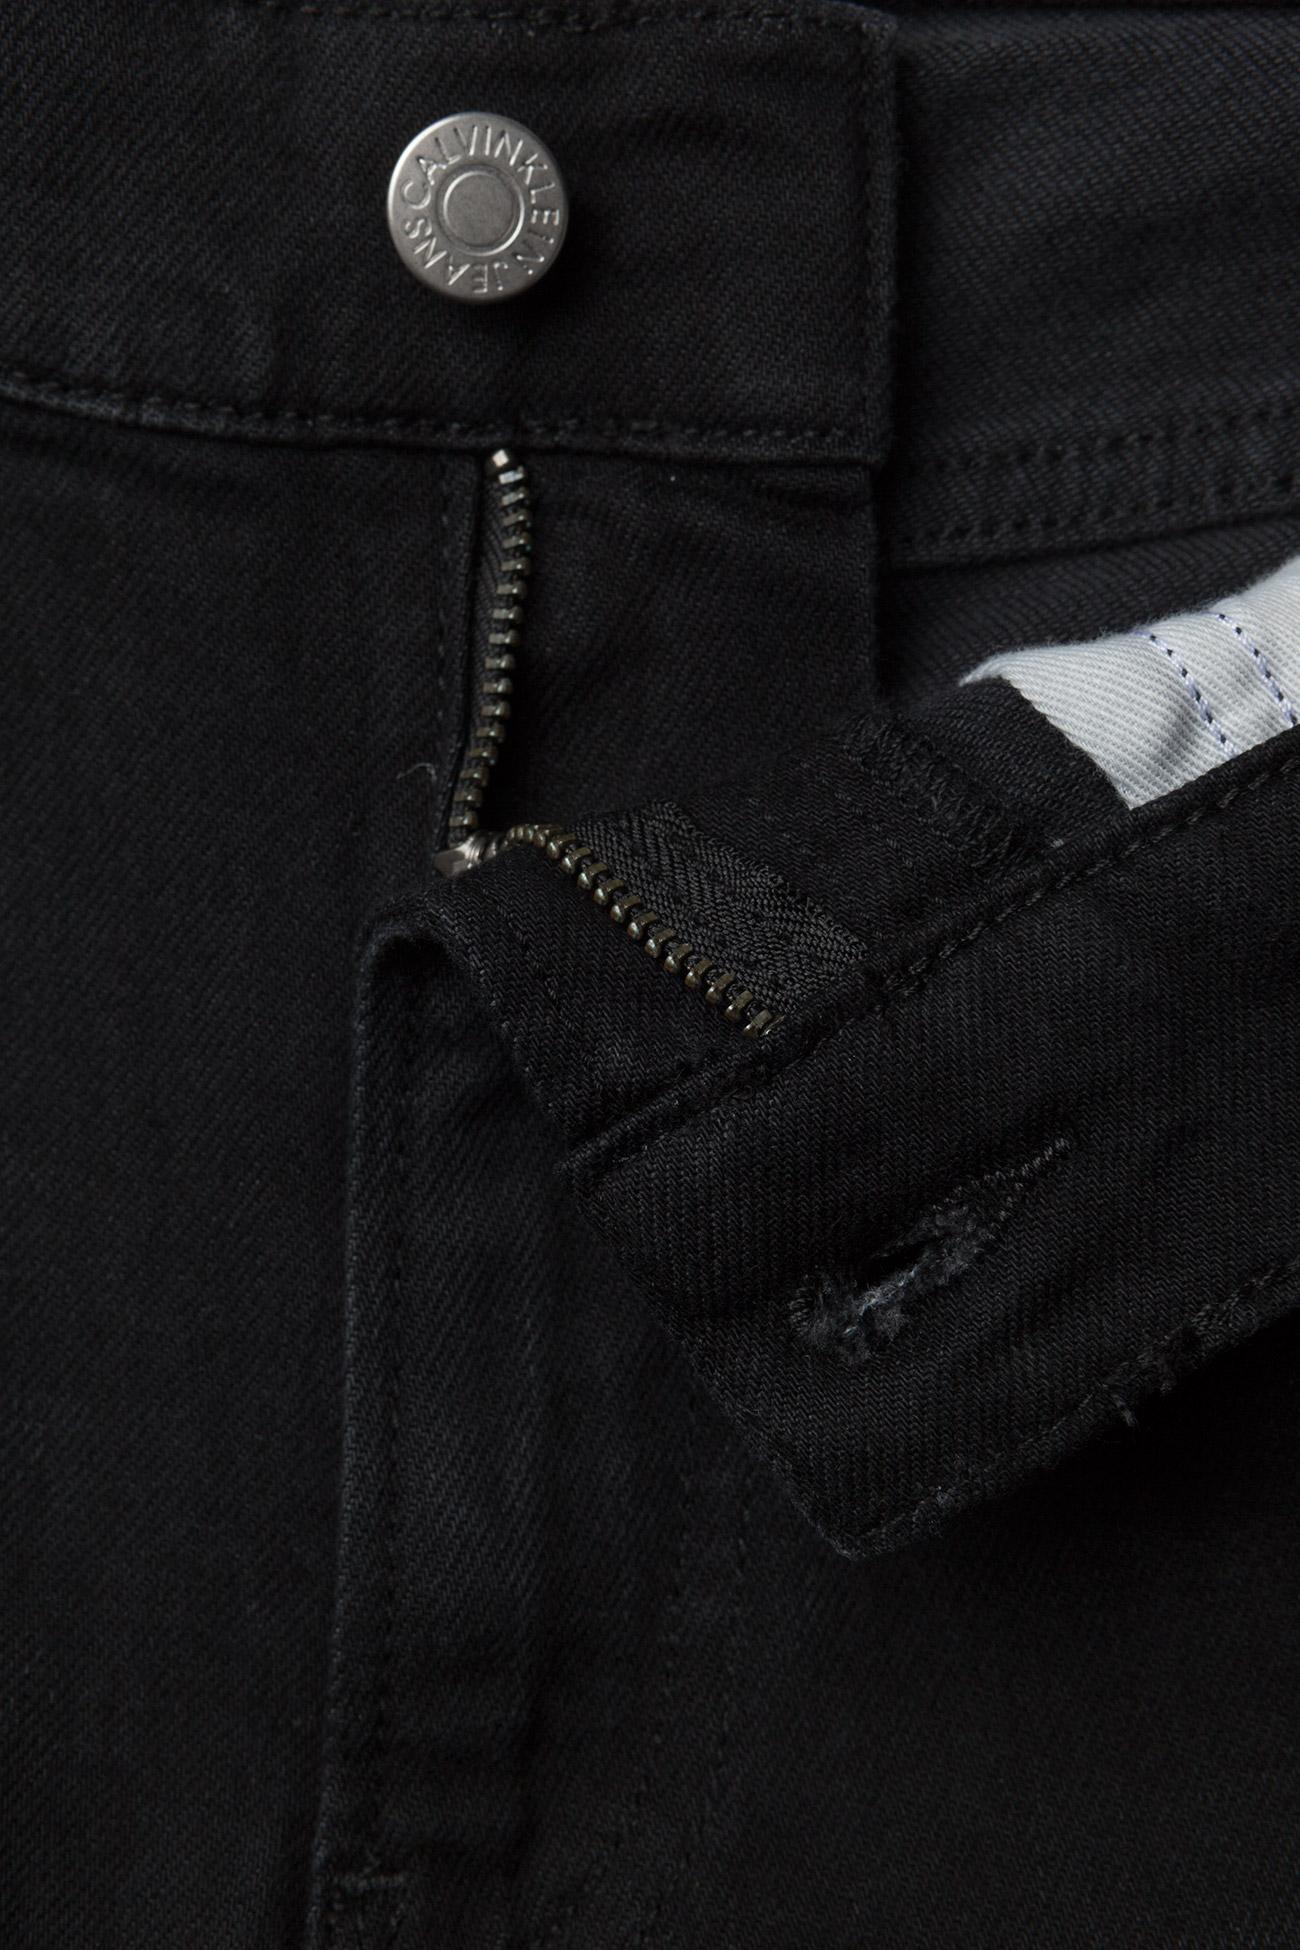 026Slimwestcopenhagen BlackCalvin Ckj BlackCalvin Jeans Jeans Klein Ckj Klein 026Slimwestcopenhagen EHWD2I9